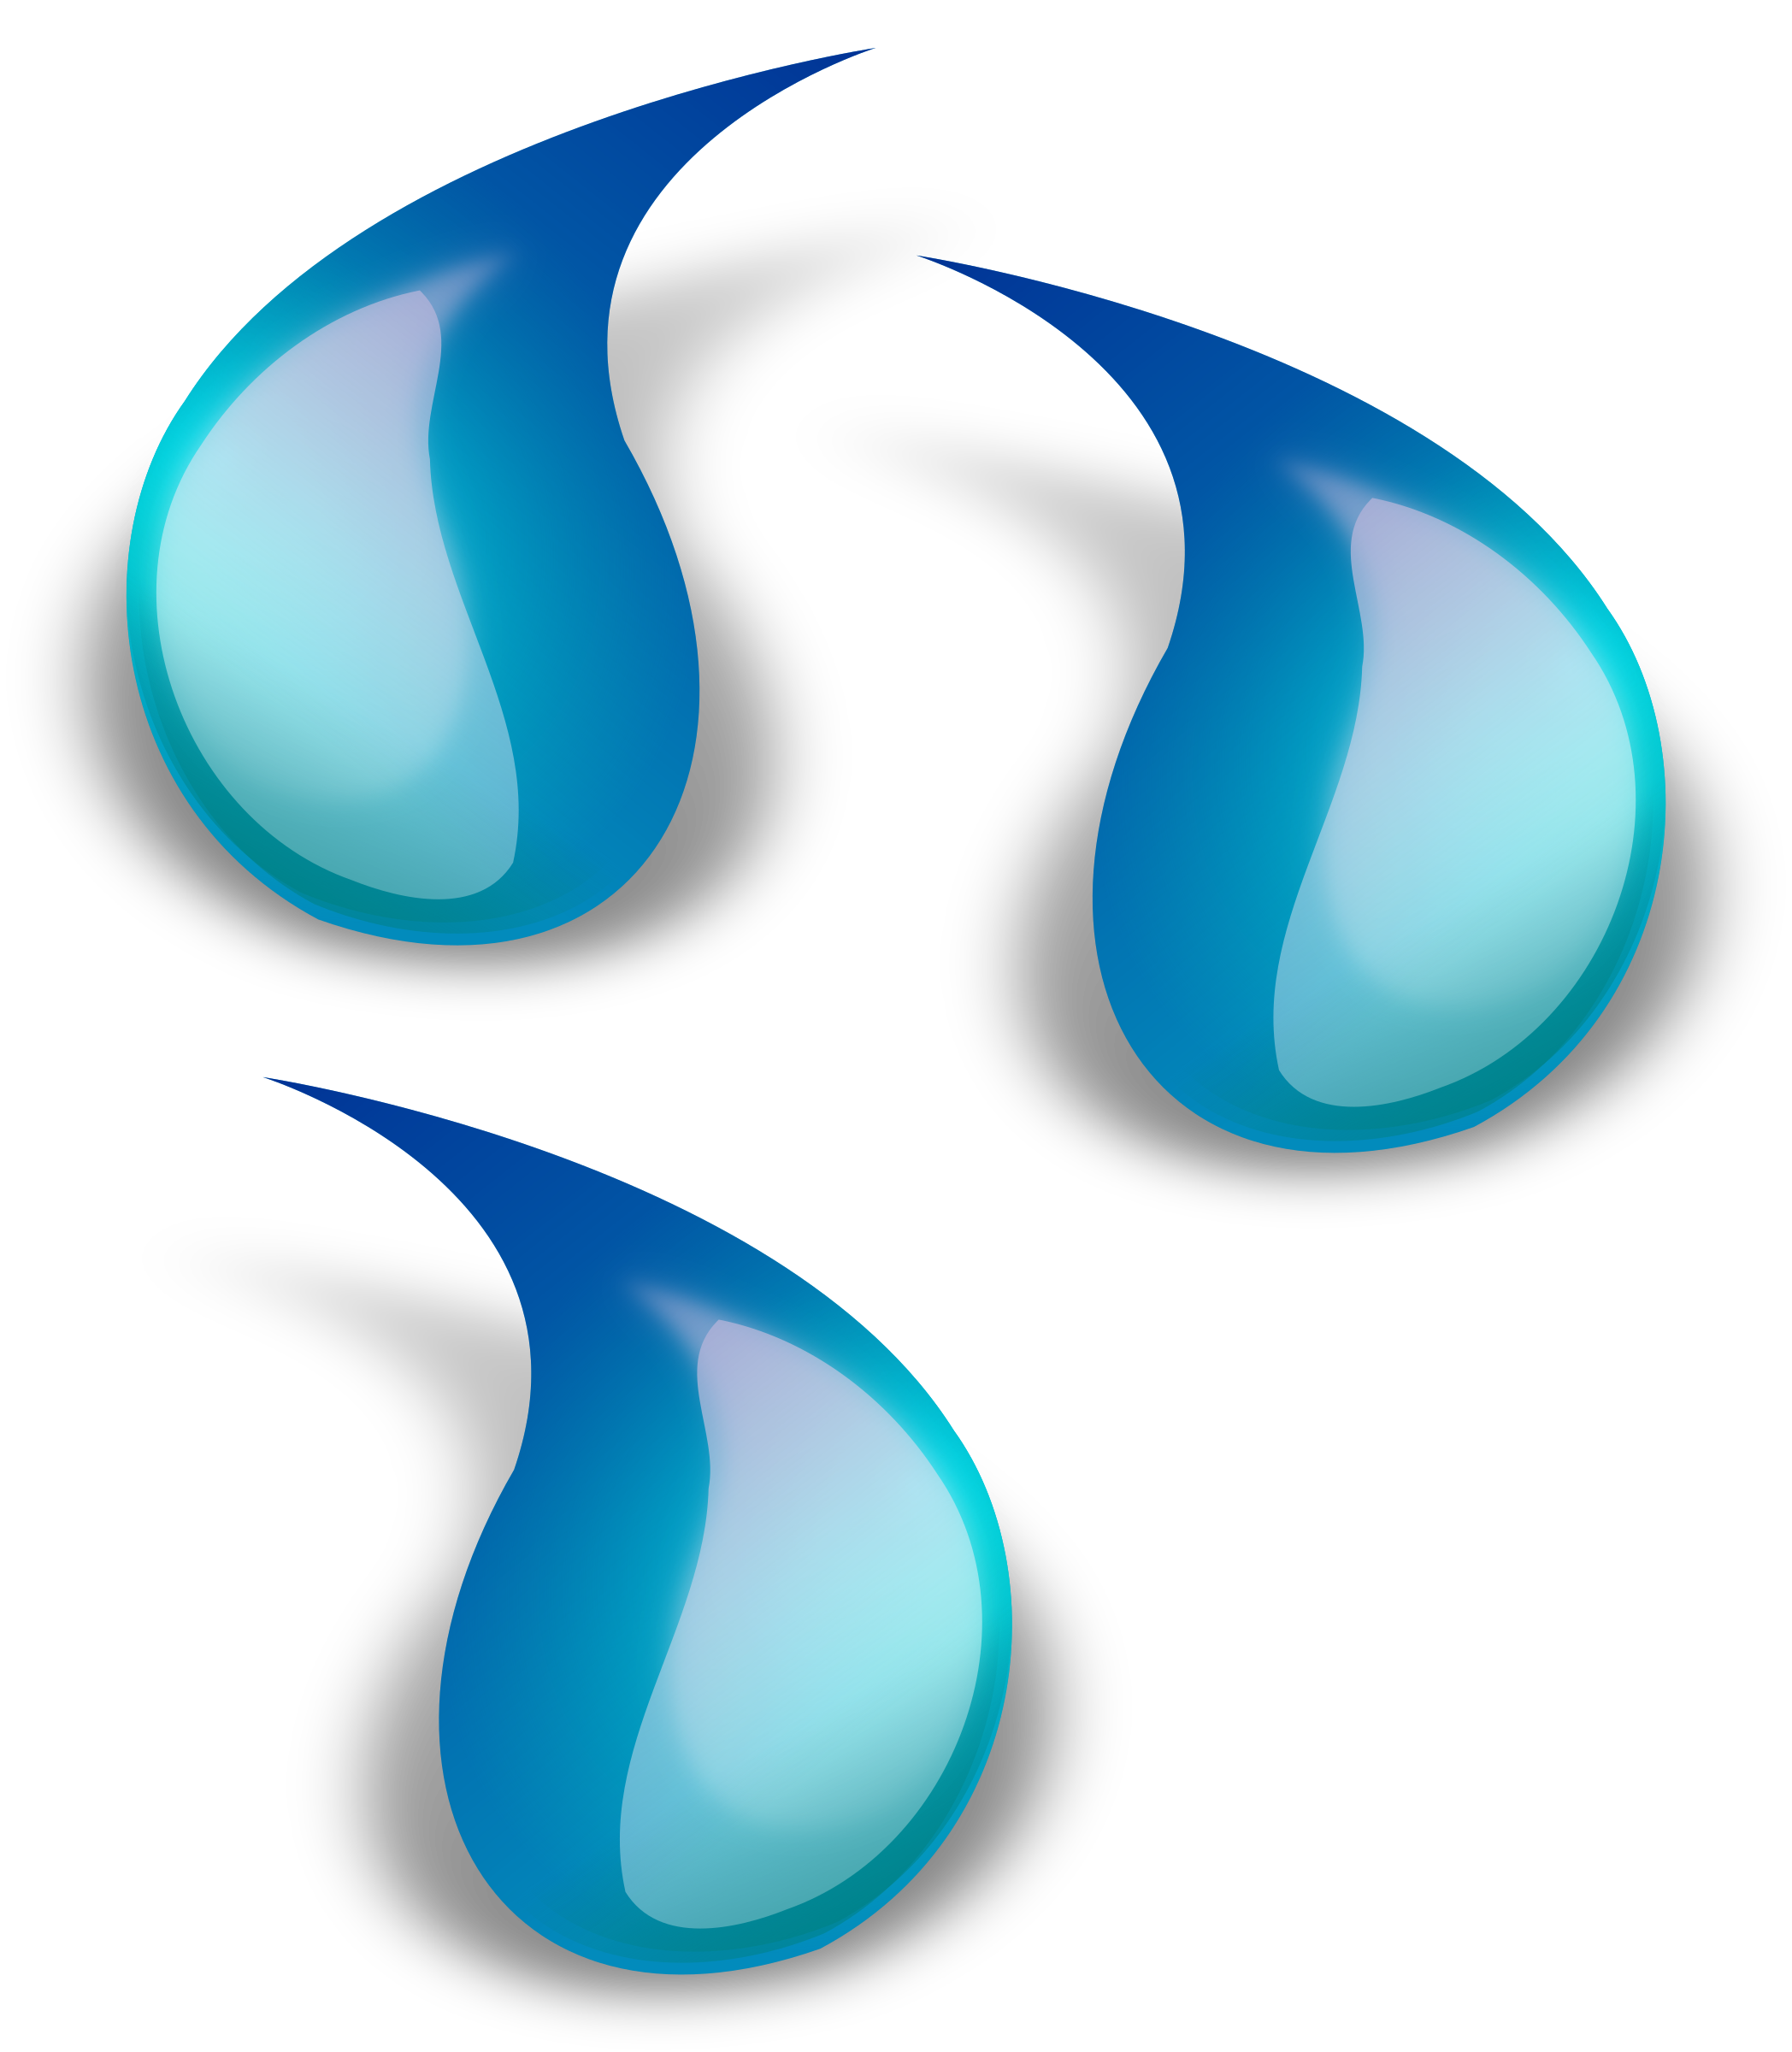 Water drop (PNG) BIG IMAGE